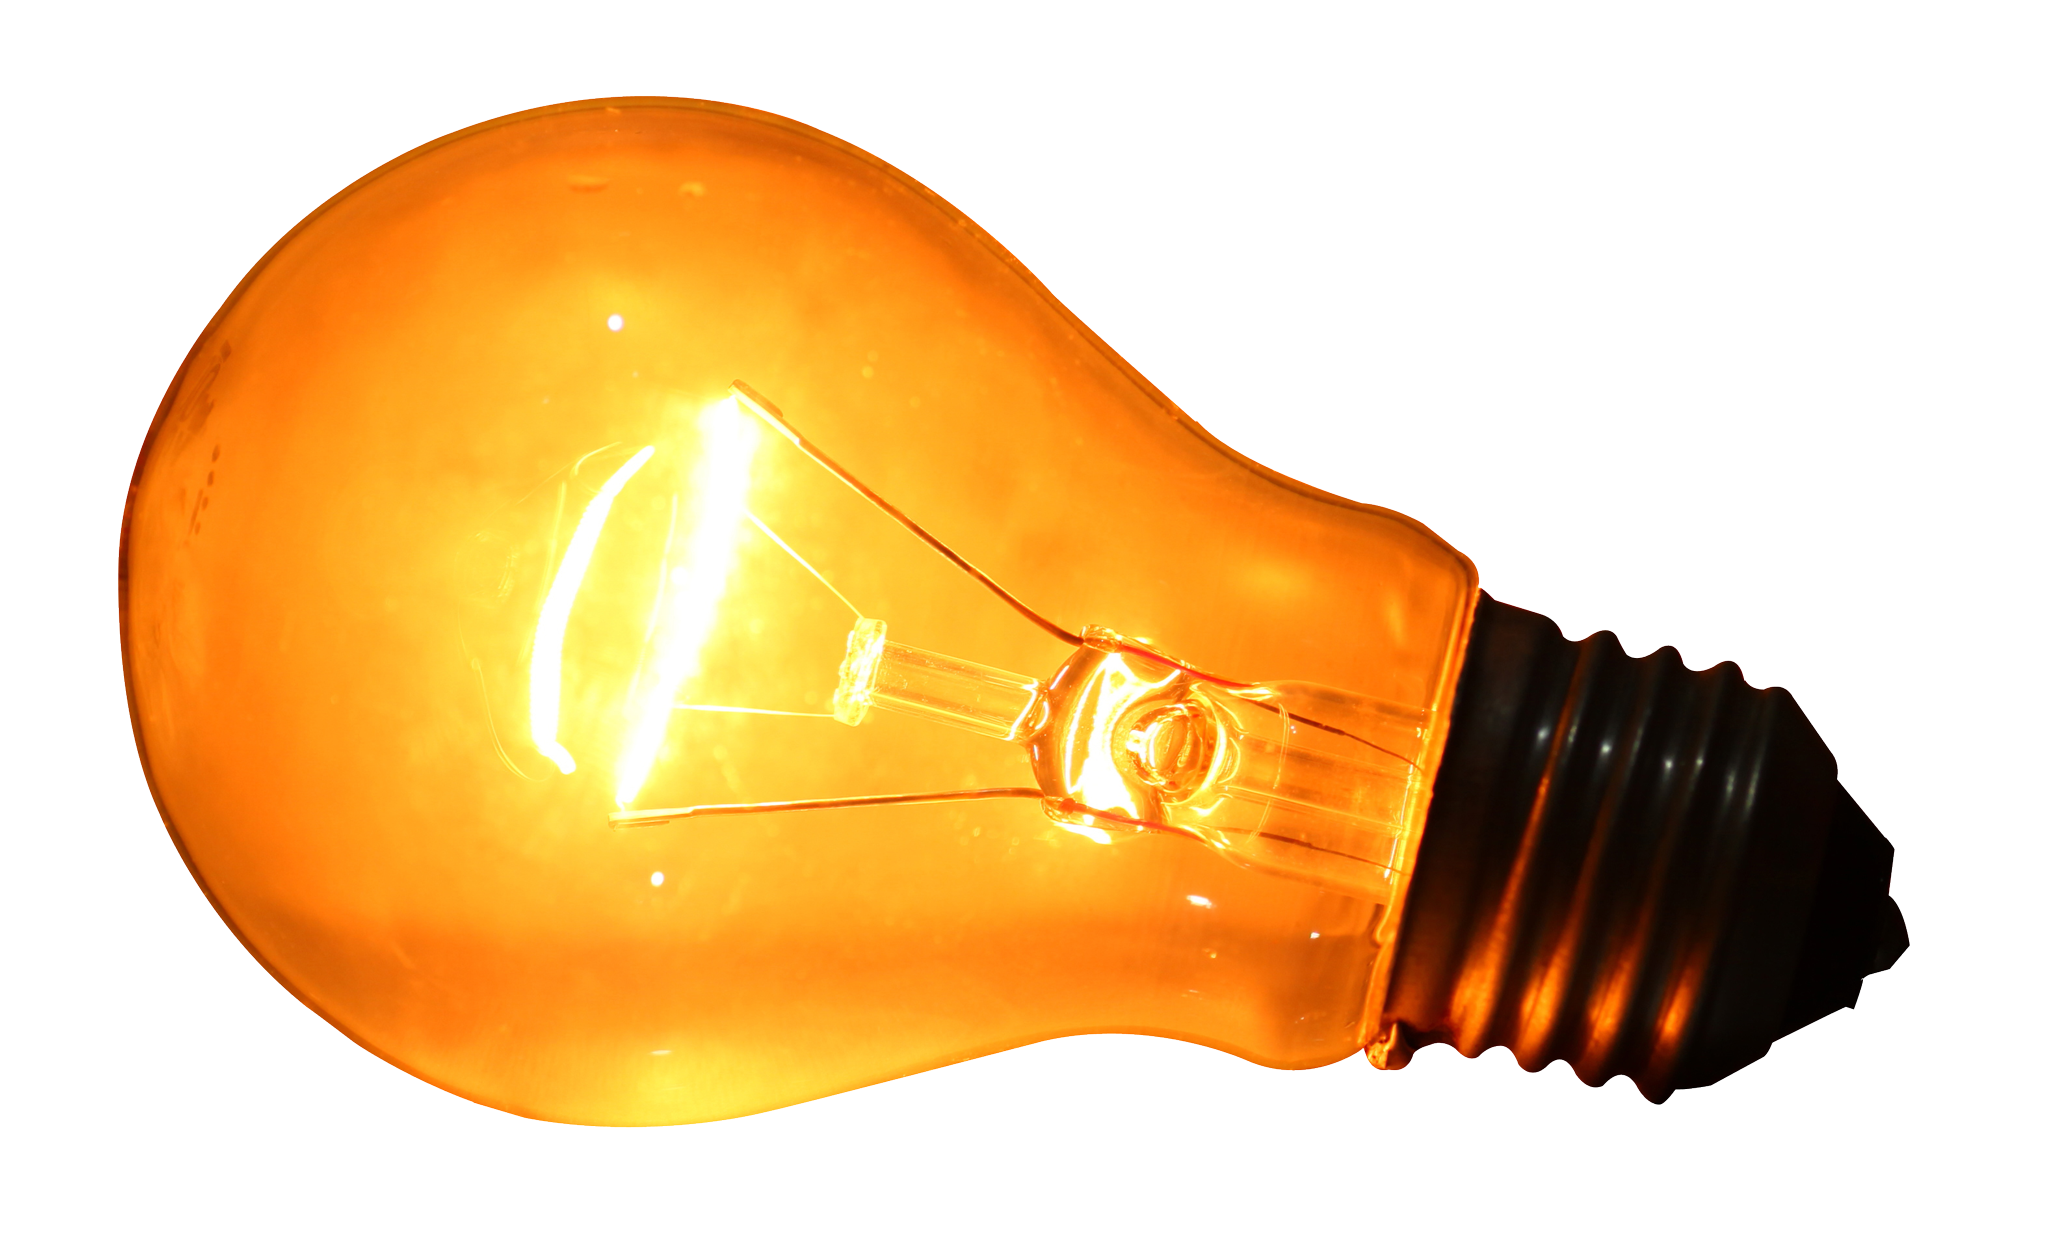 Light Bulb PNG Transparent Image - Light Bulb PNG